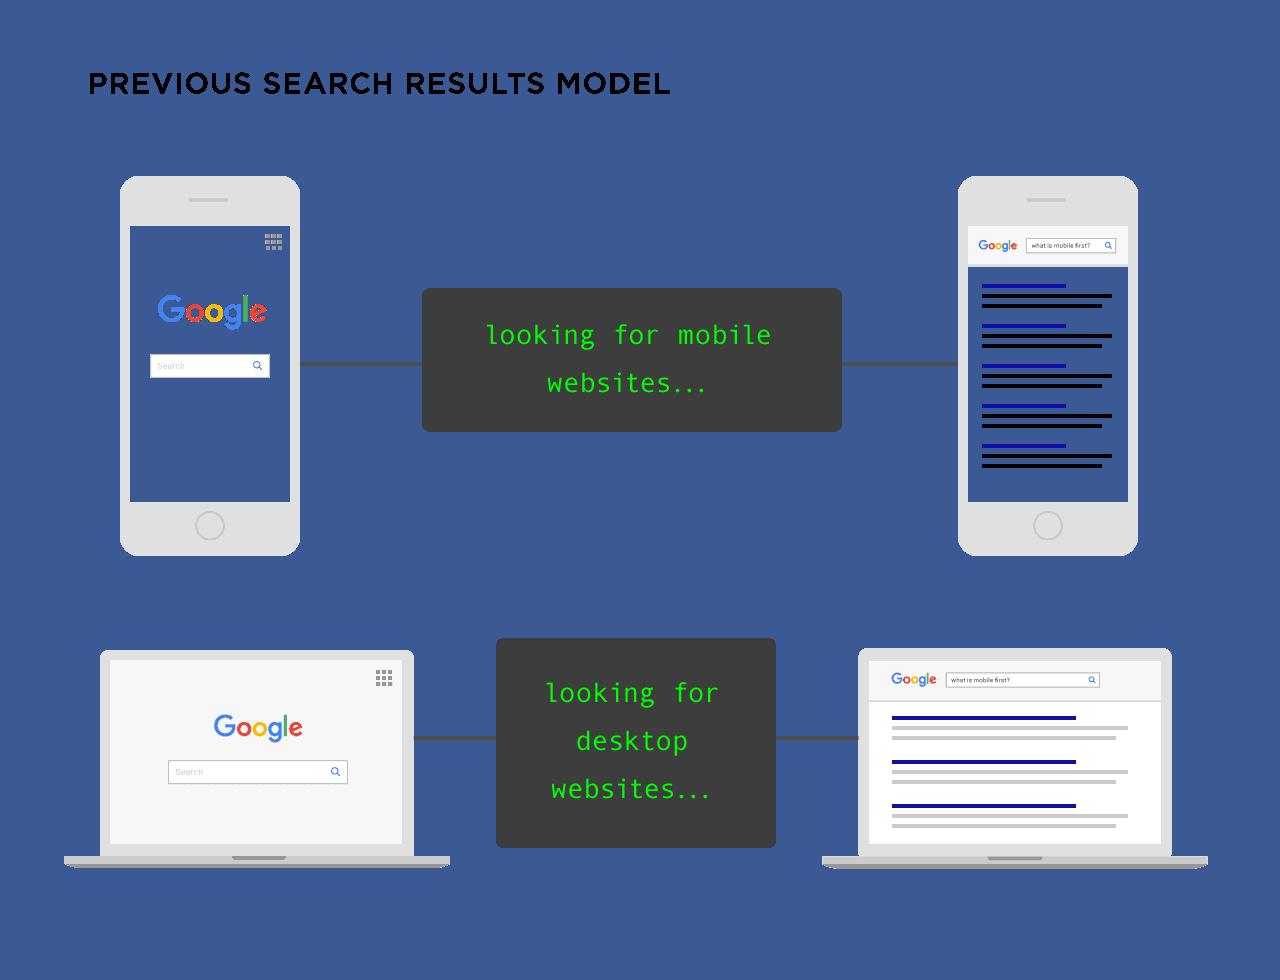 Google Search Model